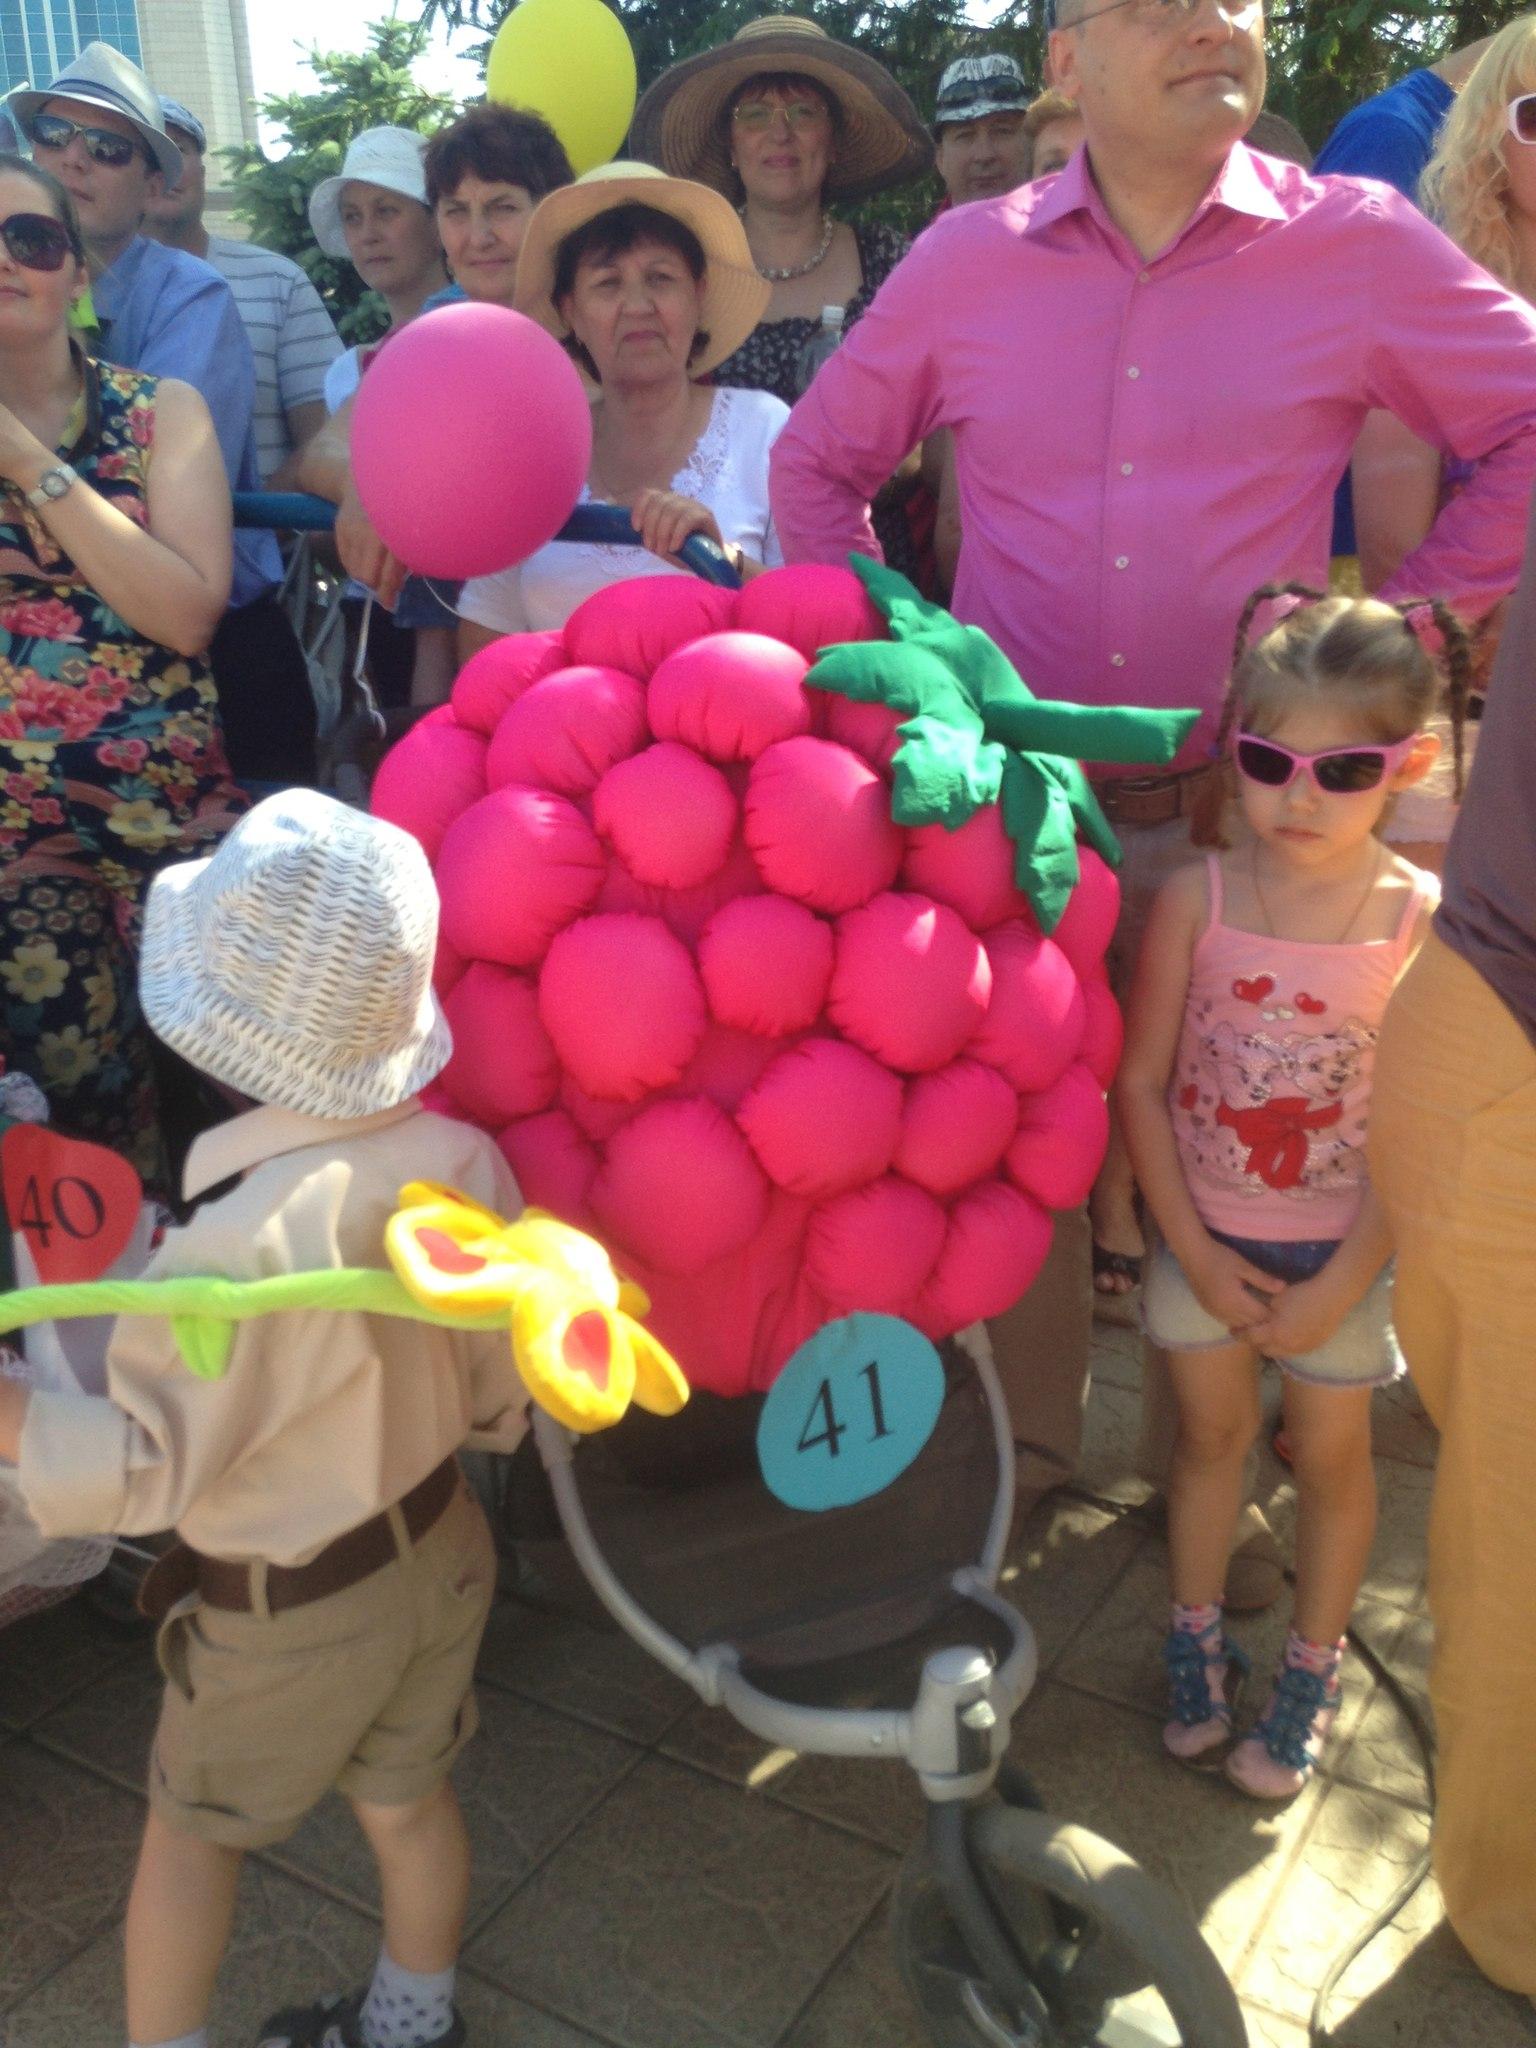 Парад колясок 2014 (19 июля) - Страница 2 XFCAmDJuQNY